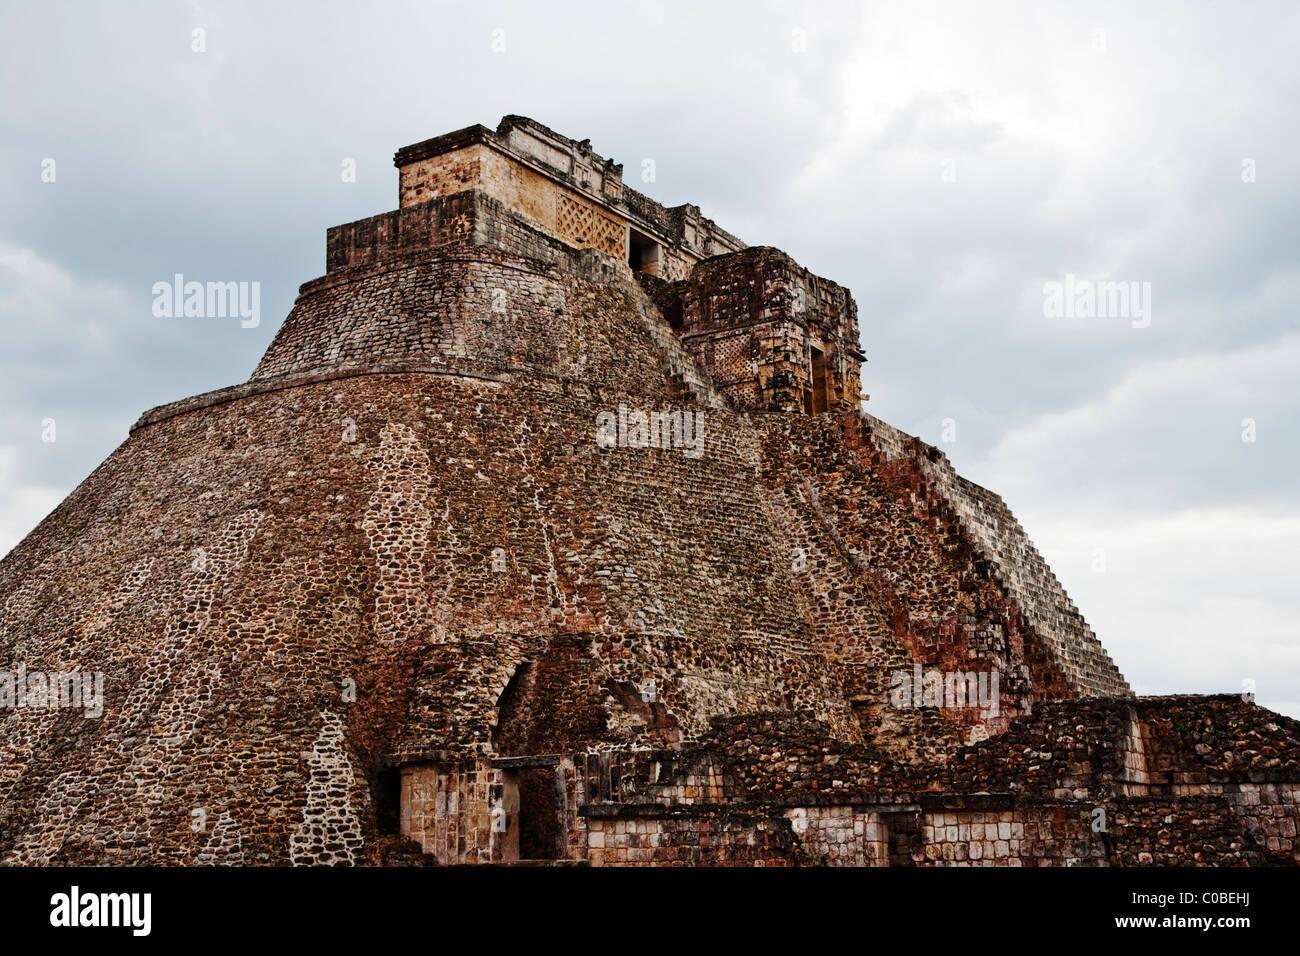 Pyramid of the Magician, Uxmal, Yucatan, Mexico - Stock Image